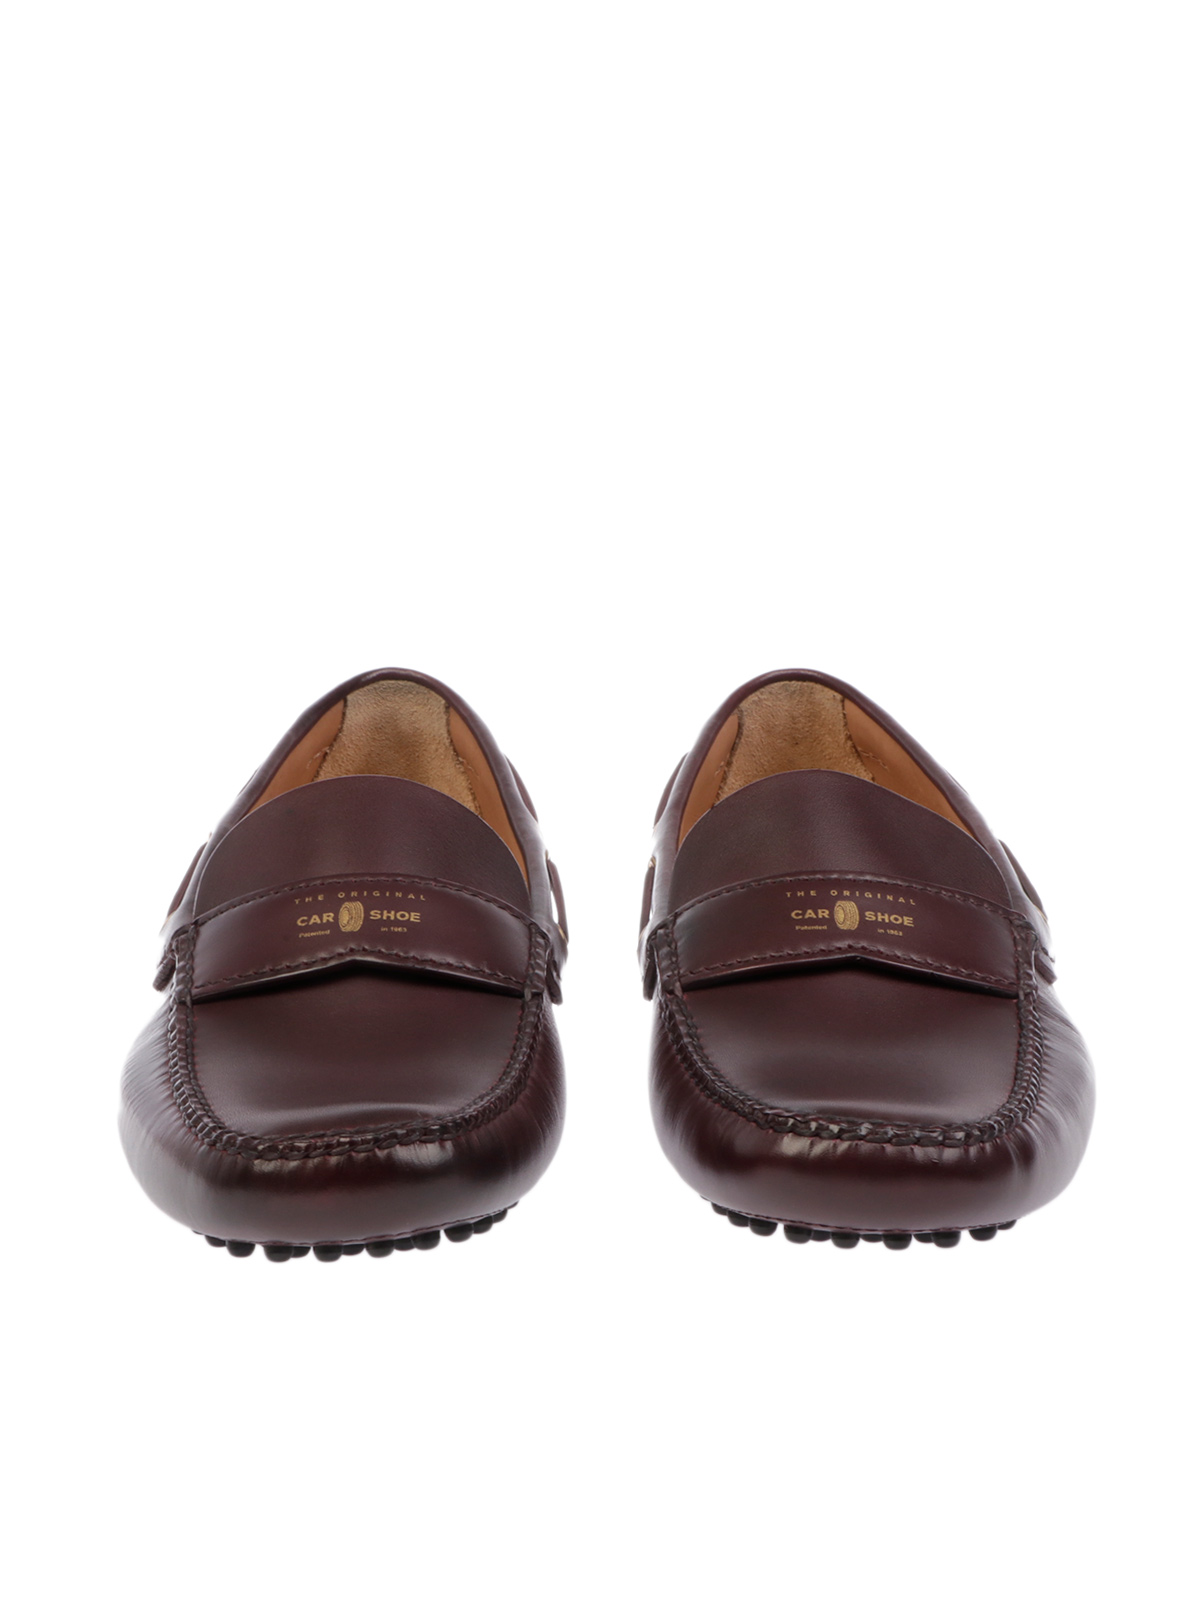 Picture of CAR Shoe | Men's Soft Calf Driving Shoe